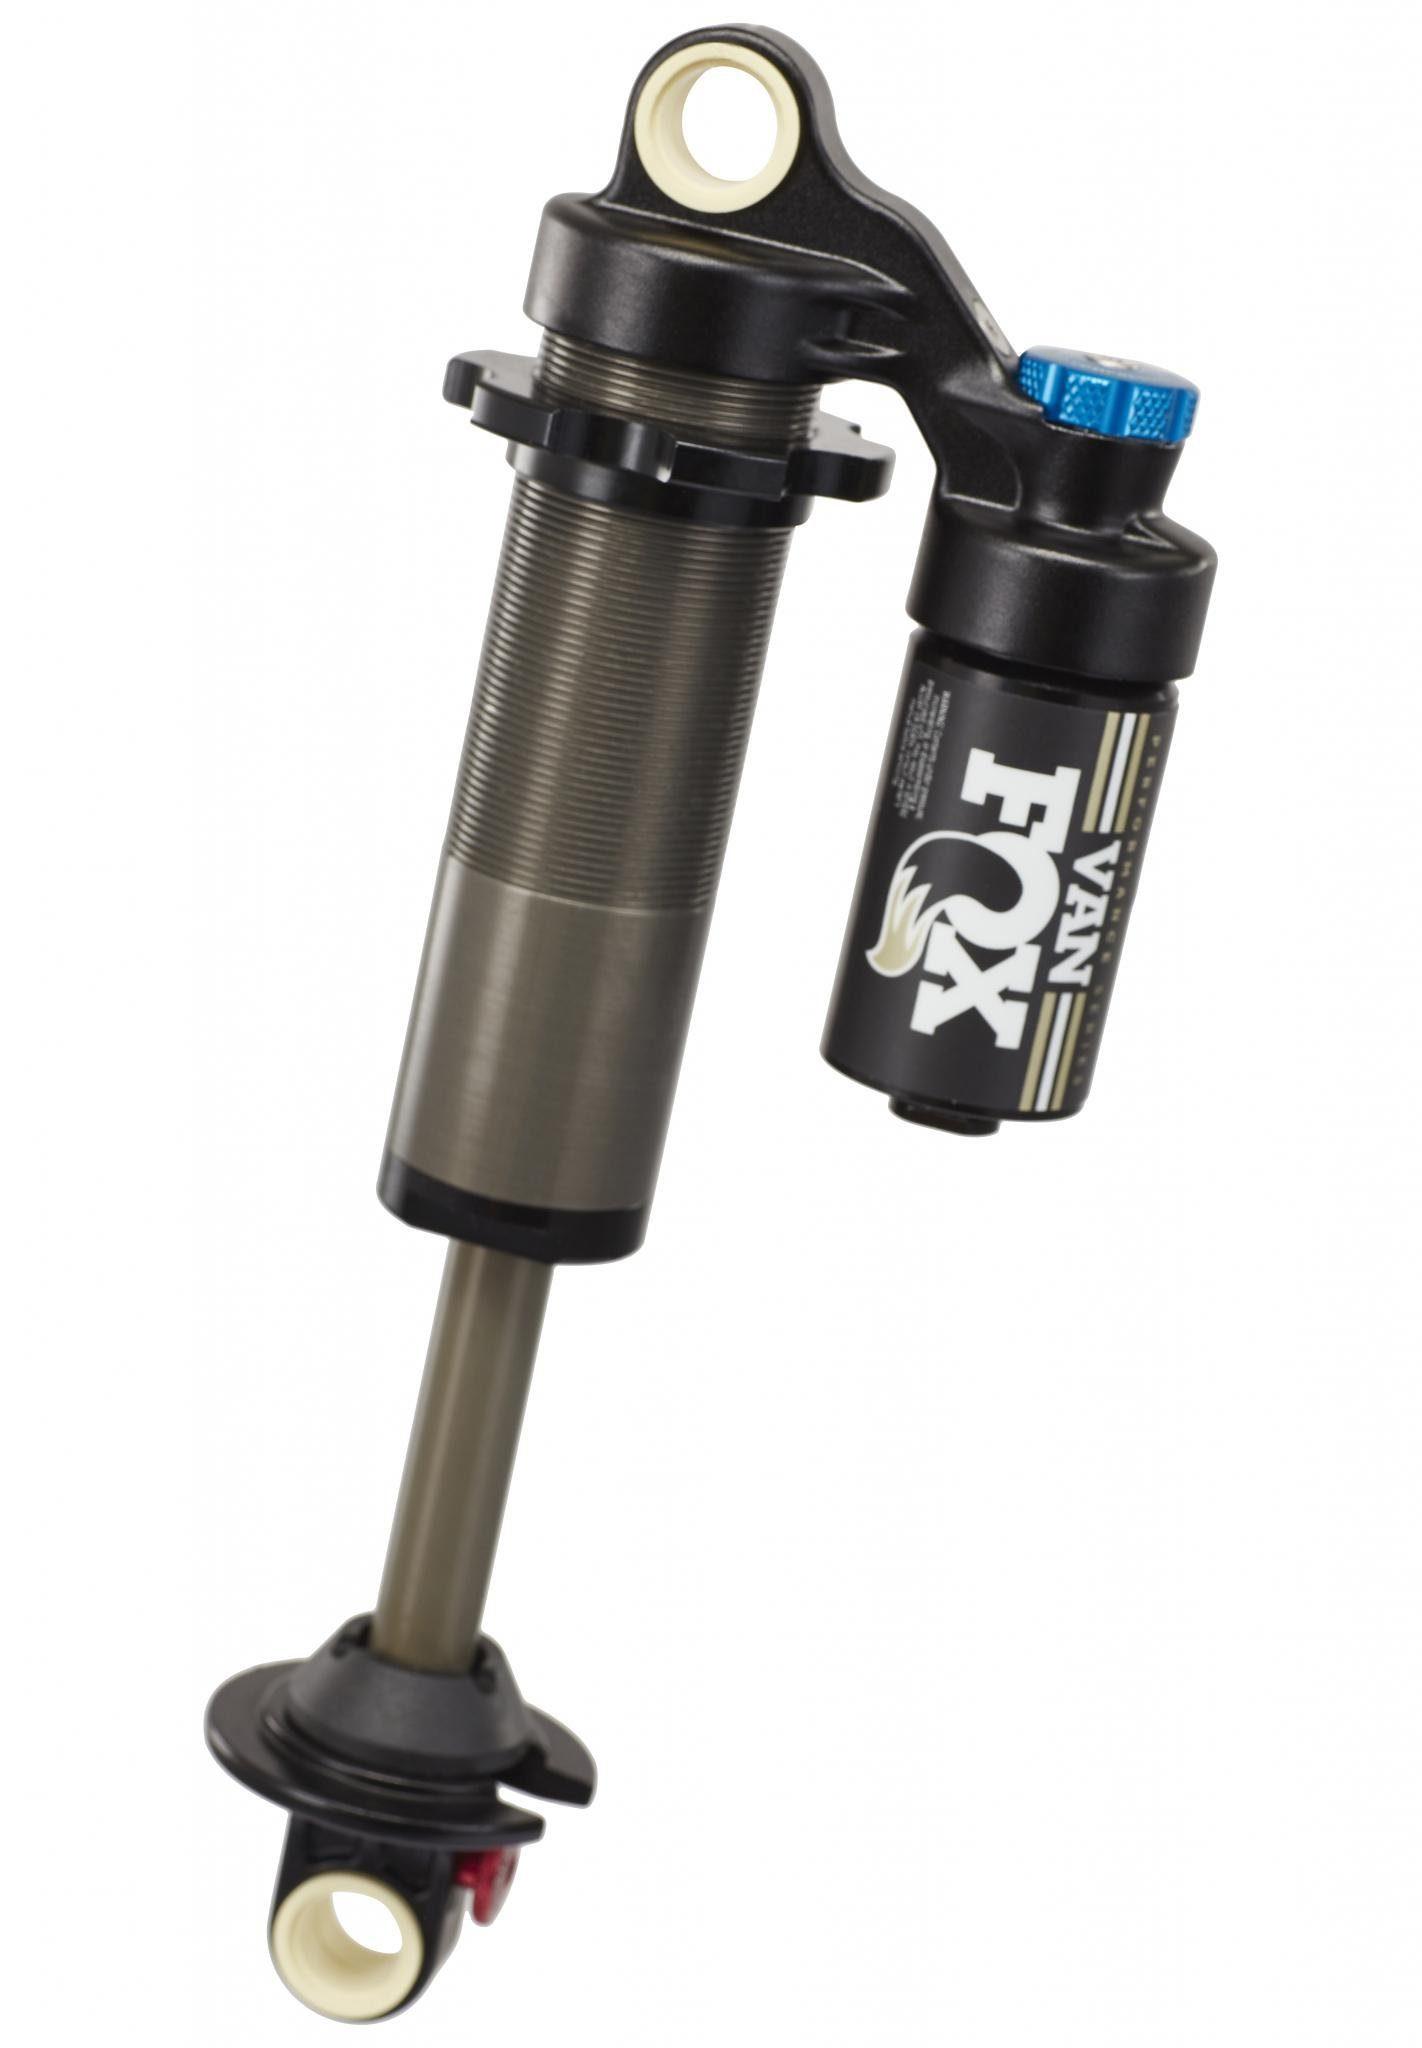 Fox Racing Shox Fahrrad Dämpfer »Fox Racing Shox Van Performance LSC 200 x 51mm«